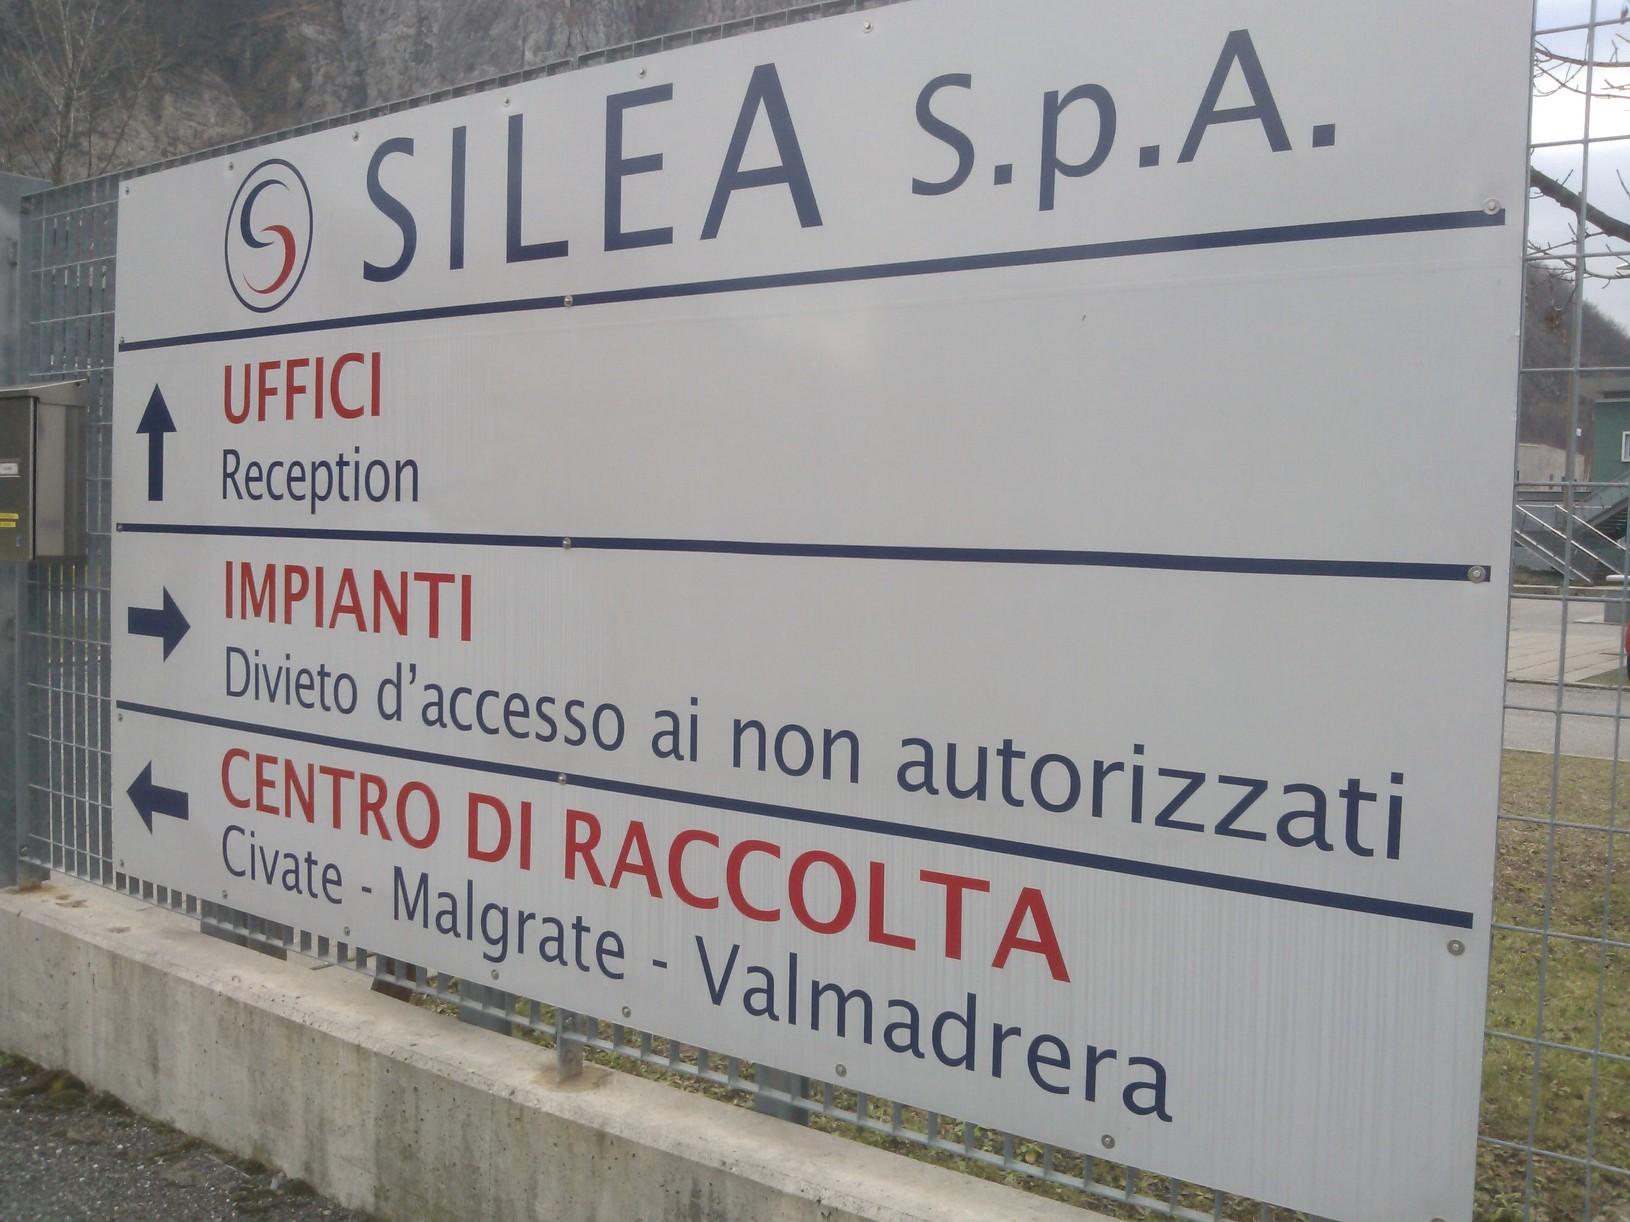 silea-spa-uffici